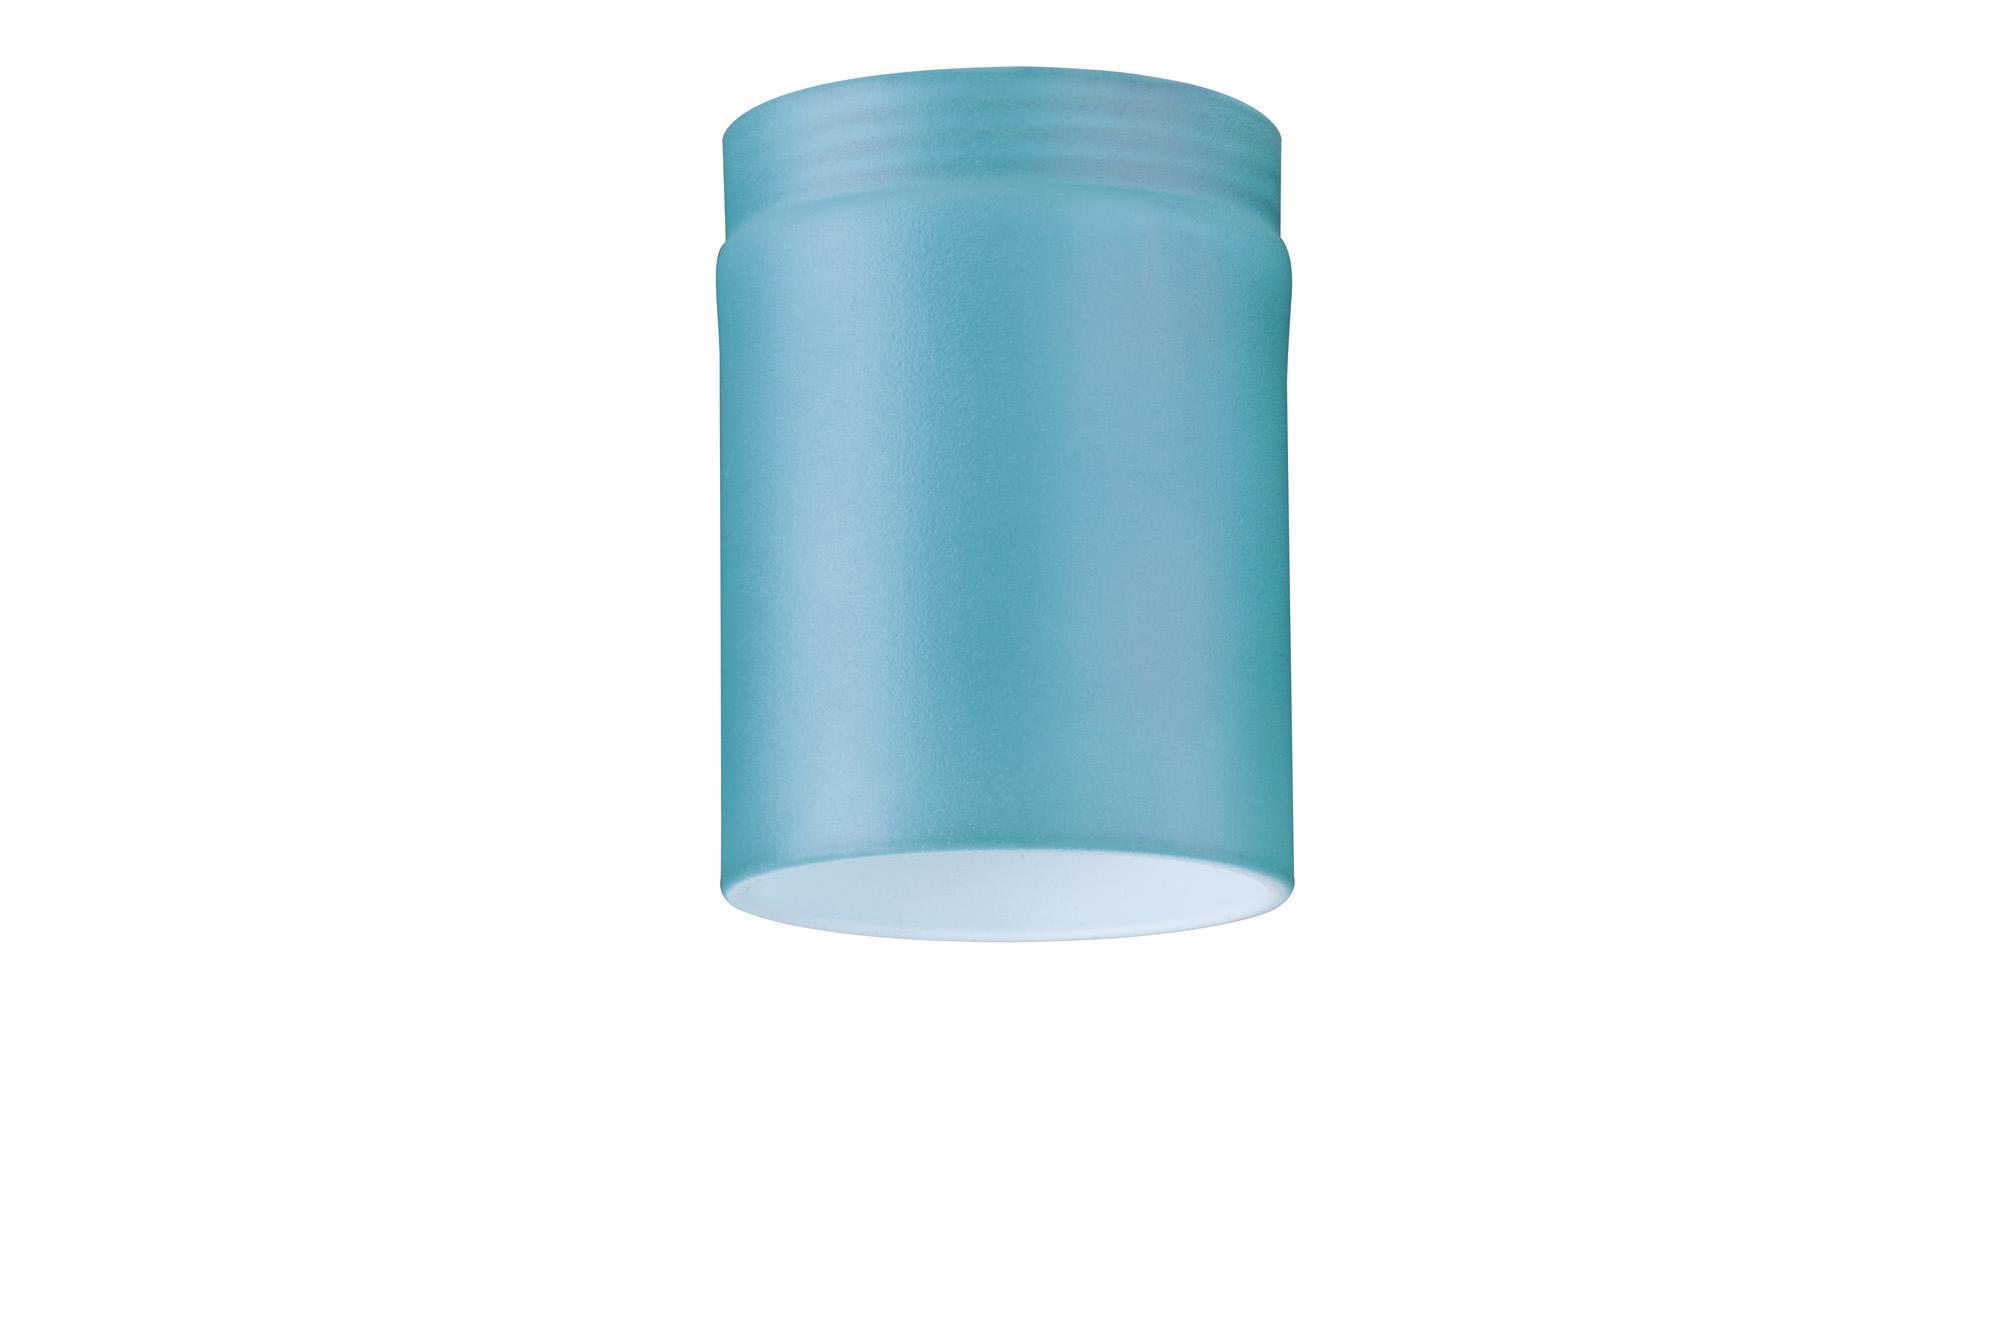 Paulmann. 92576 Плафон для DecoSystems Tube Mini, blue, стекло